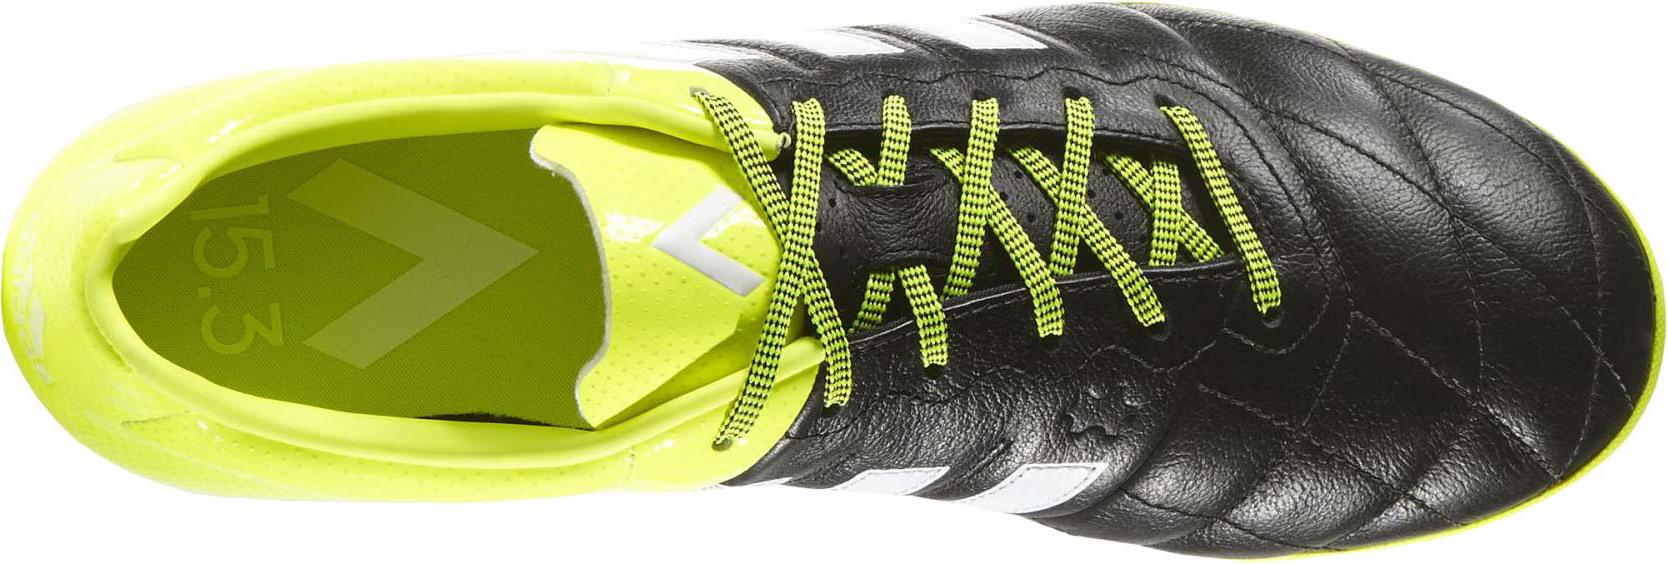 new arrival 329d4 9dc9a adidas ACE 15.3 TF LEATHER | sportisimo.com